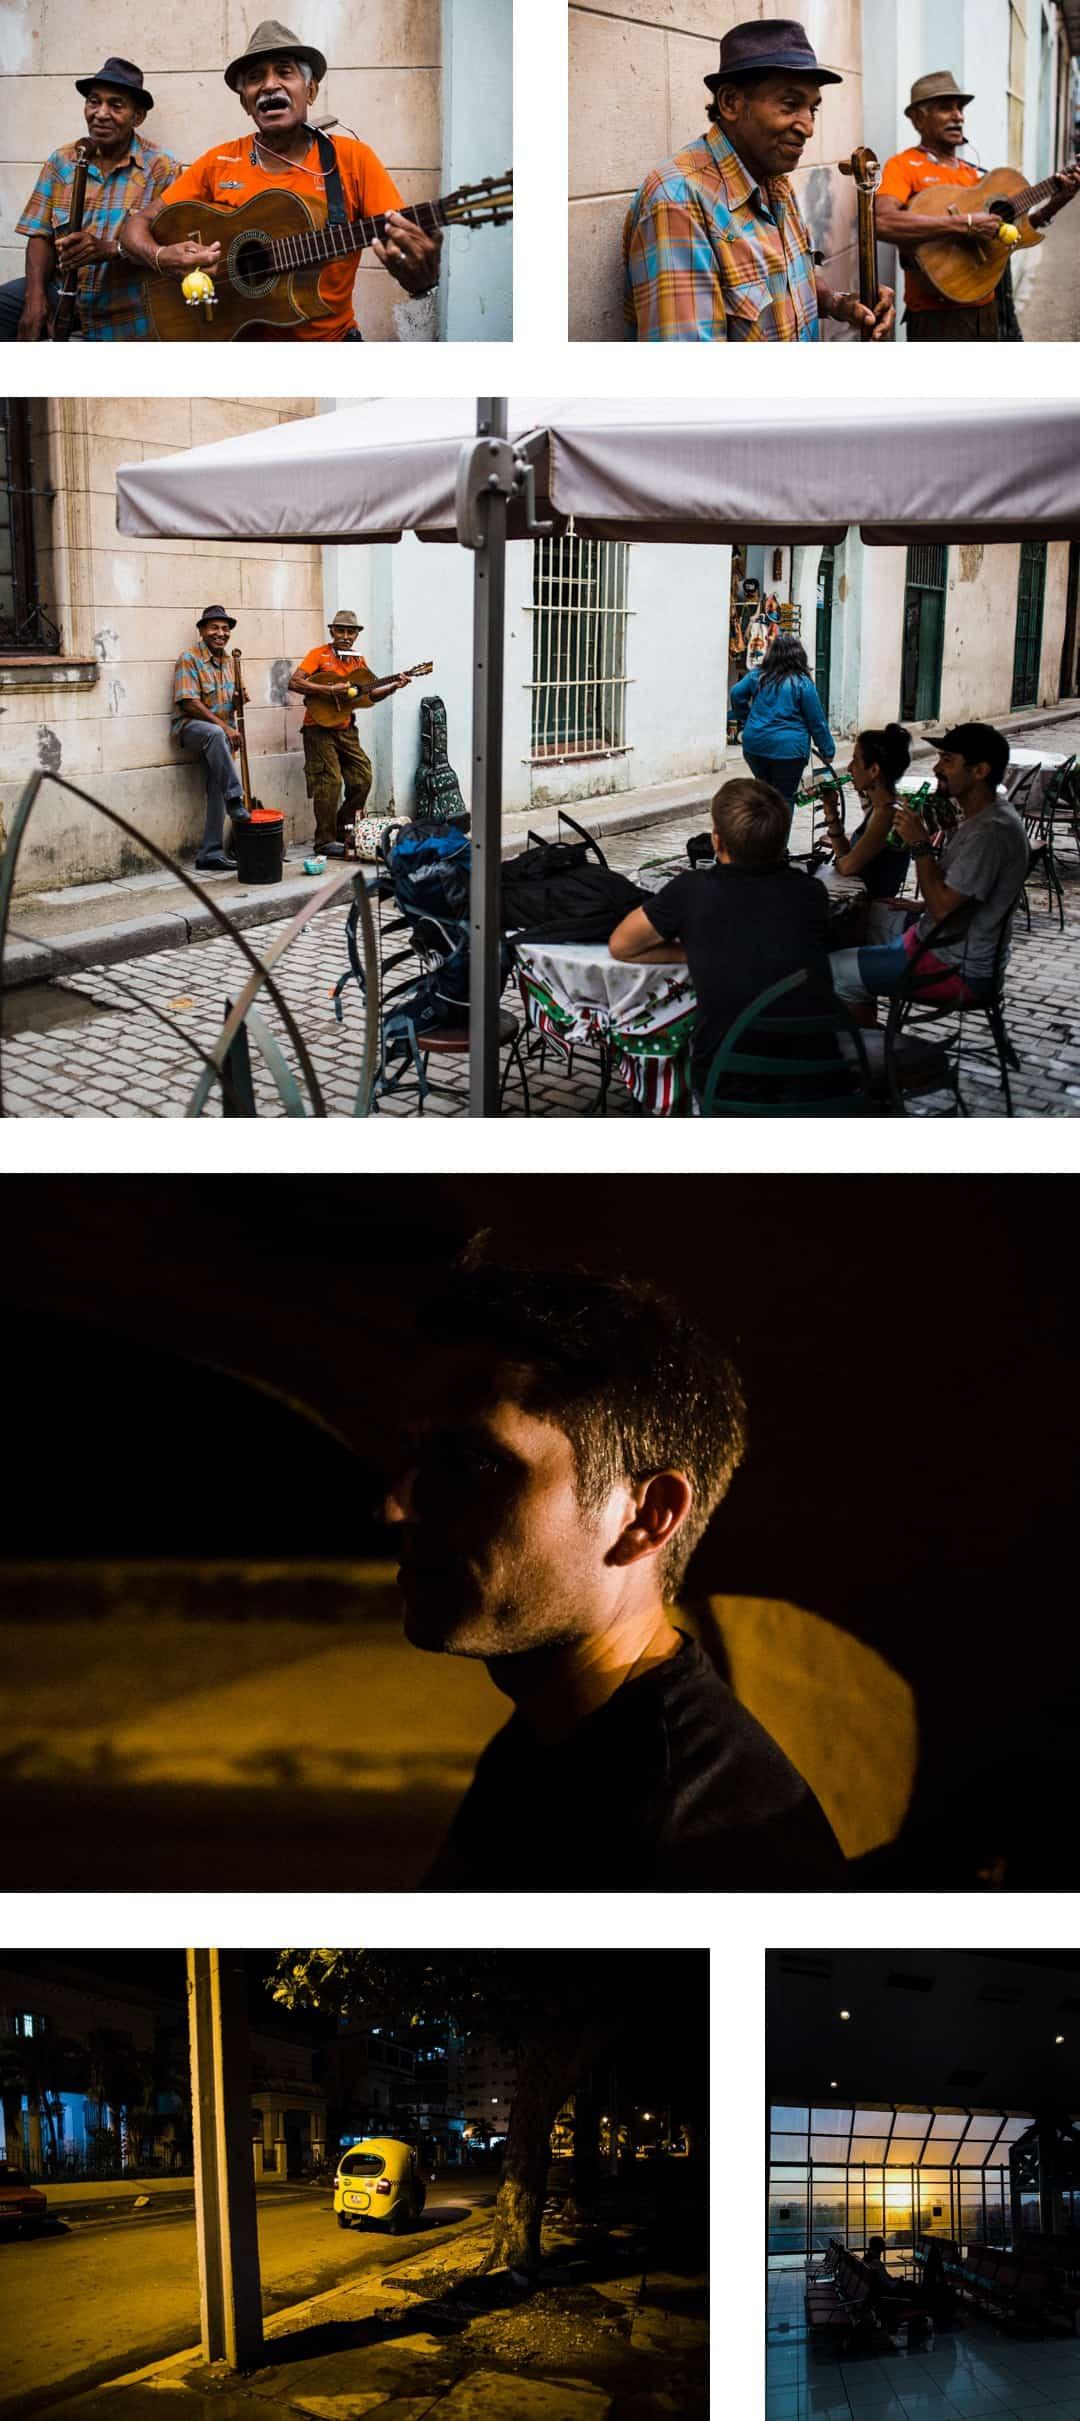 Last night in La Habana, Cuba